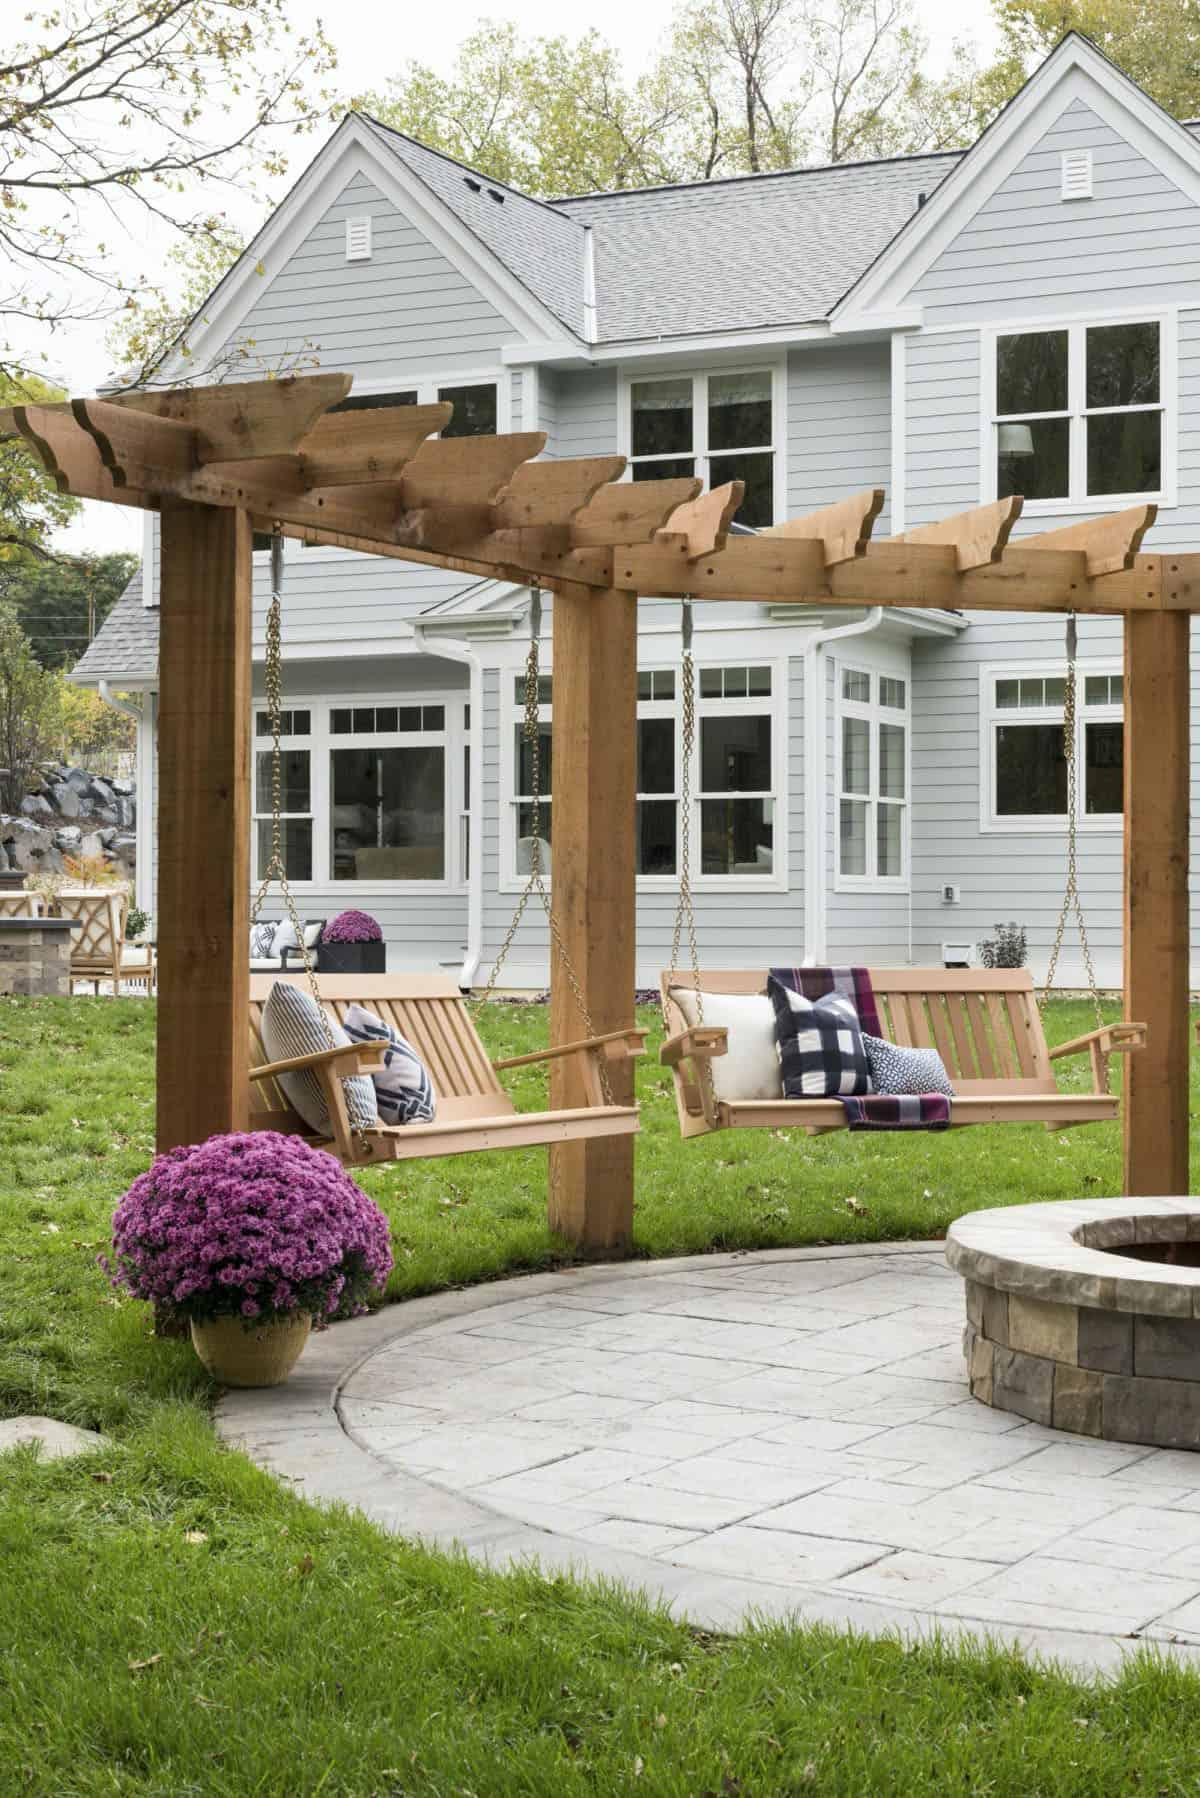 patio-maison-côtier-anglais-traditionnel